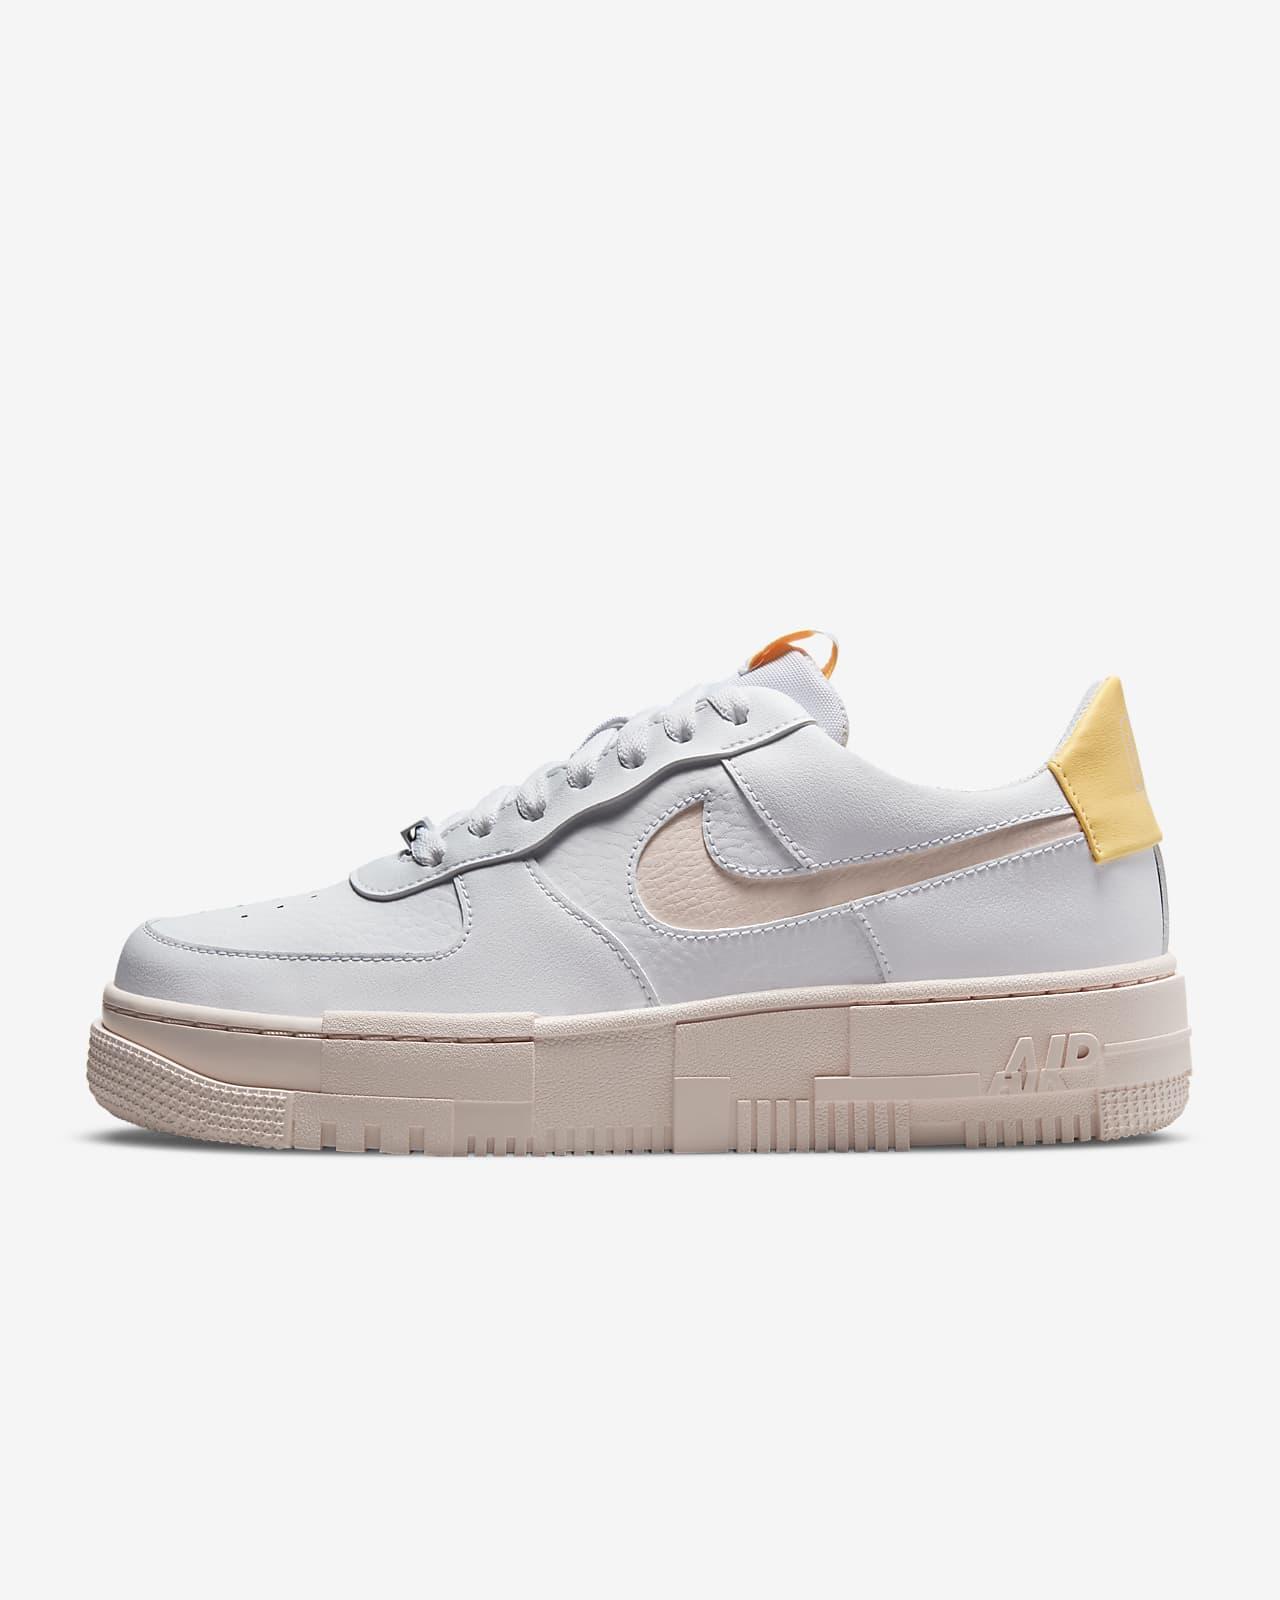 Nike AF-1 Pixel Women's Shoe